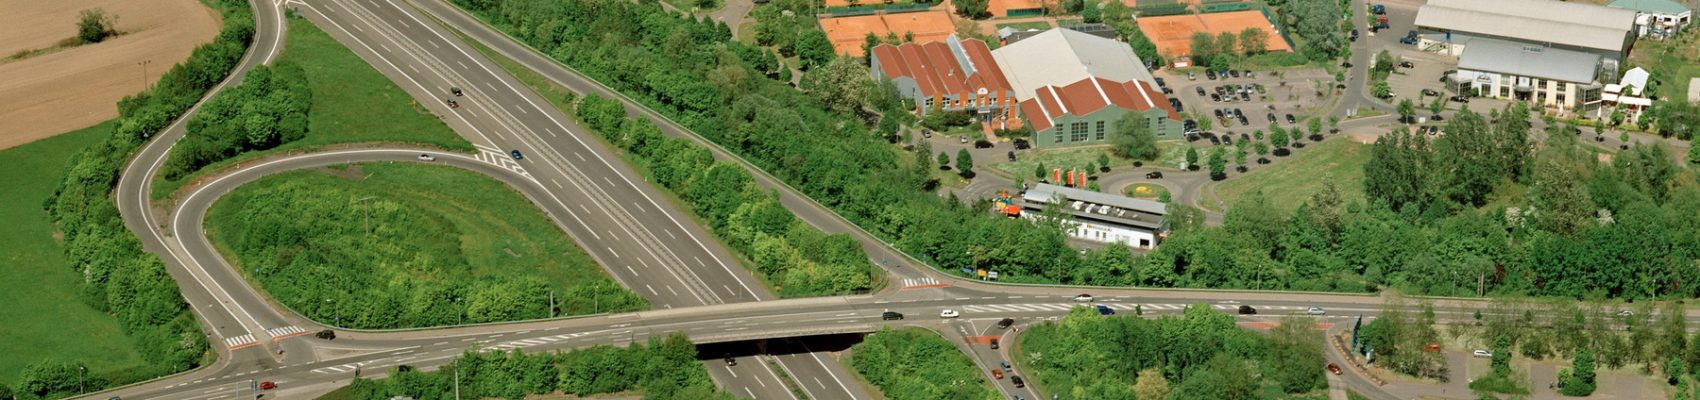 Autobahn_Verkehrshinweise